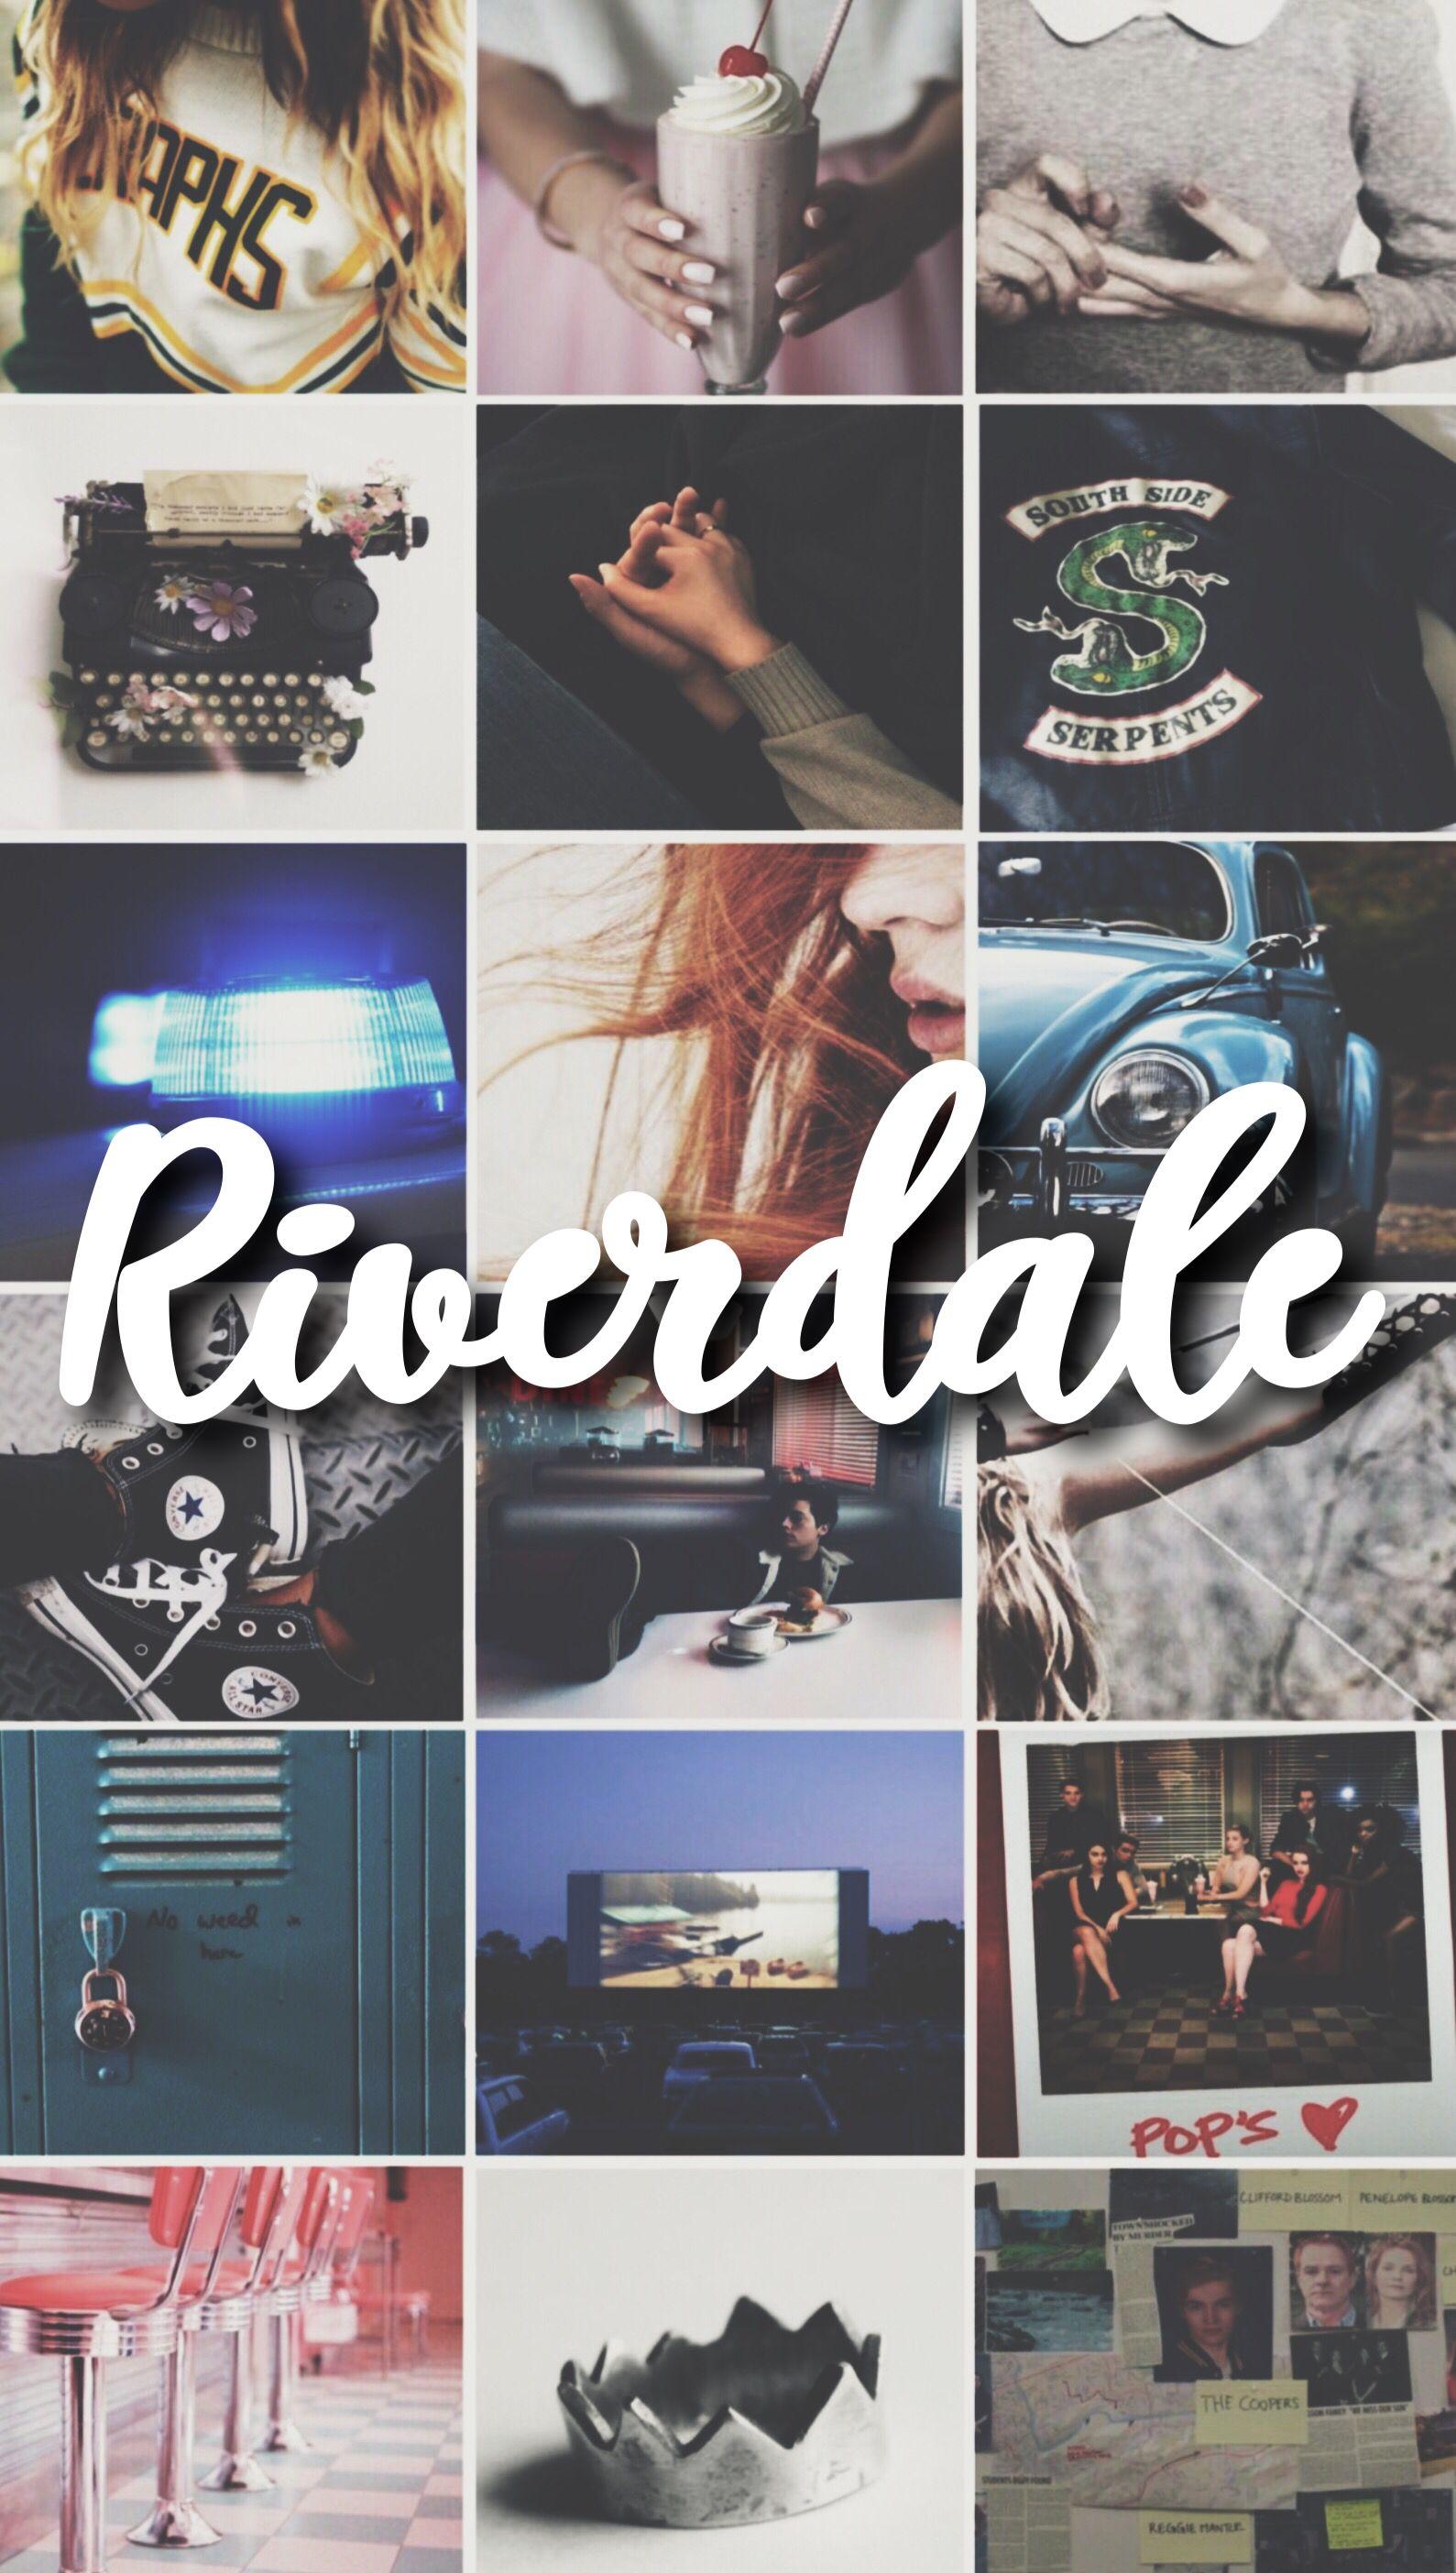 Aesthetic Riverdale - 1589x2808 ...